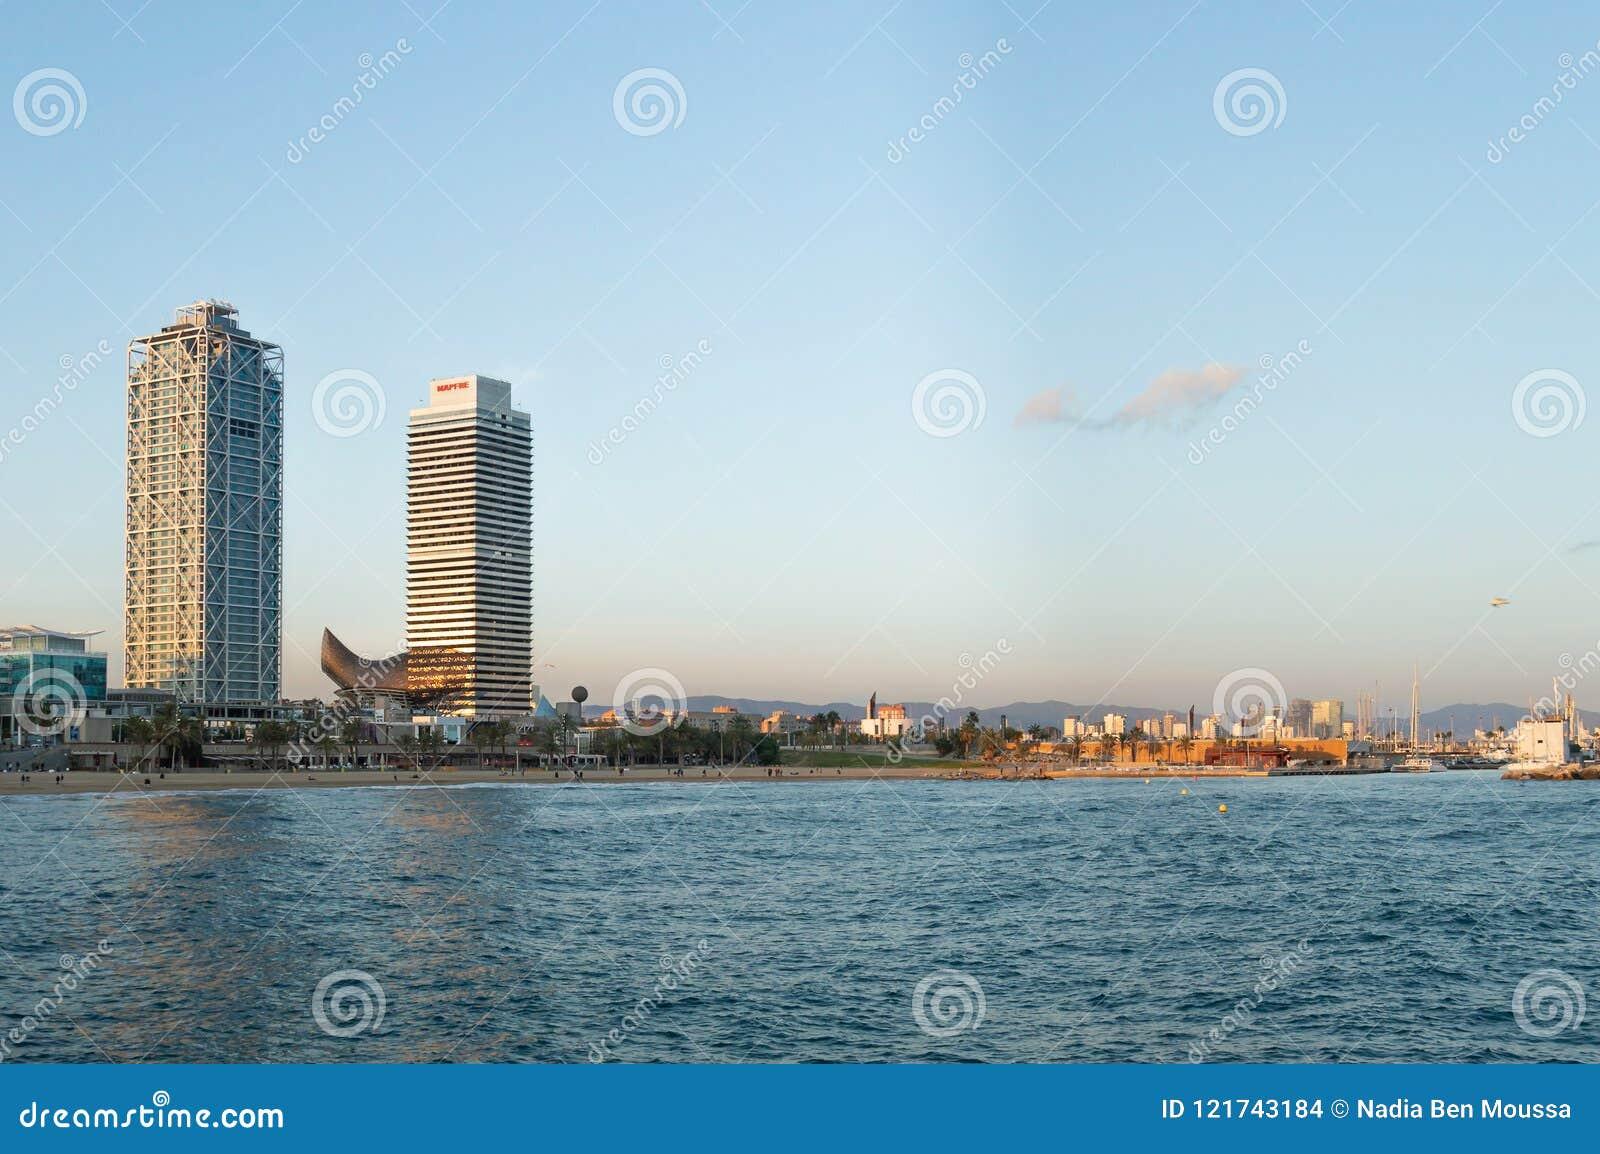 Barcelona, Spain, October, 2016: Beach panorama from the Mediterranean sea